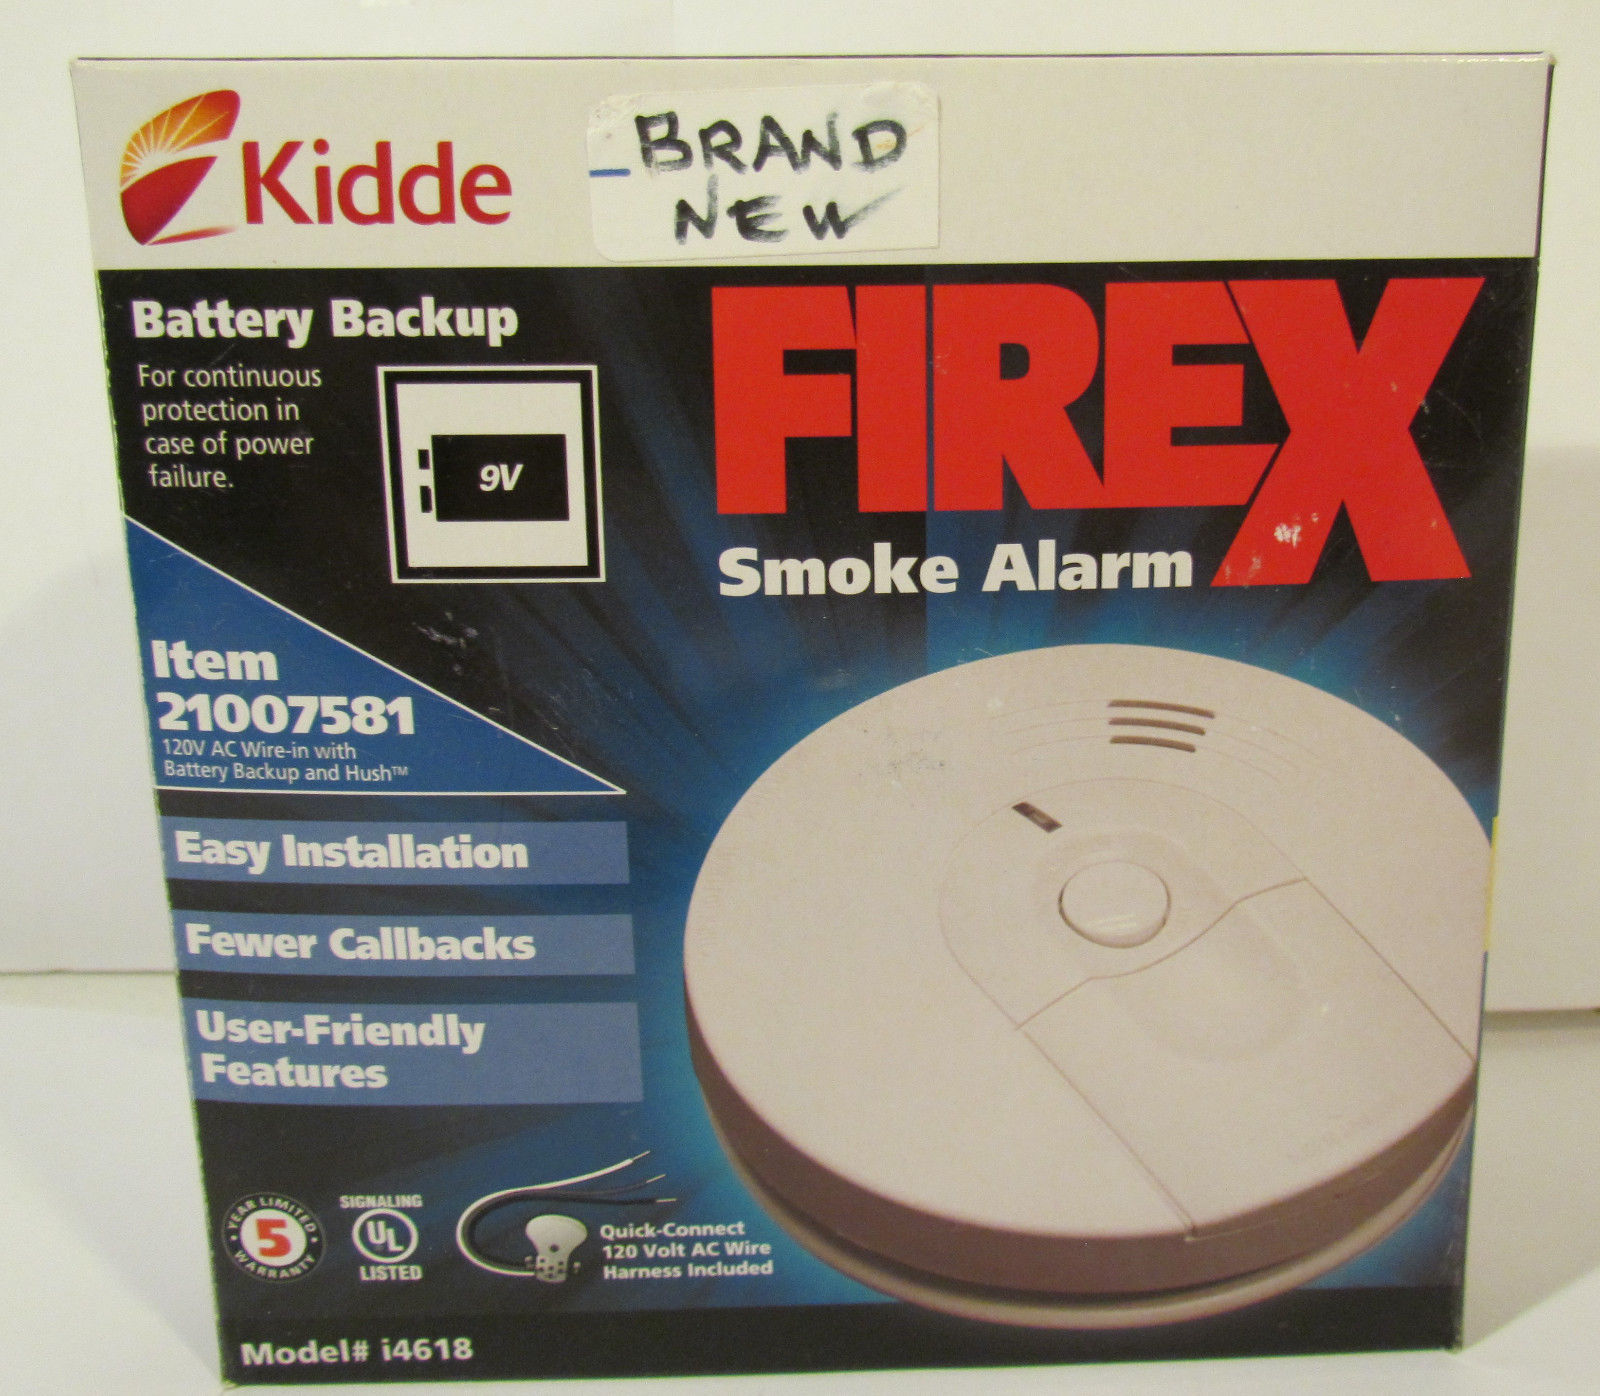 Kidde Battery Backup Firex Smoke Alarm Item And 50 Similar Items